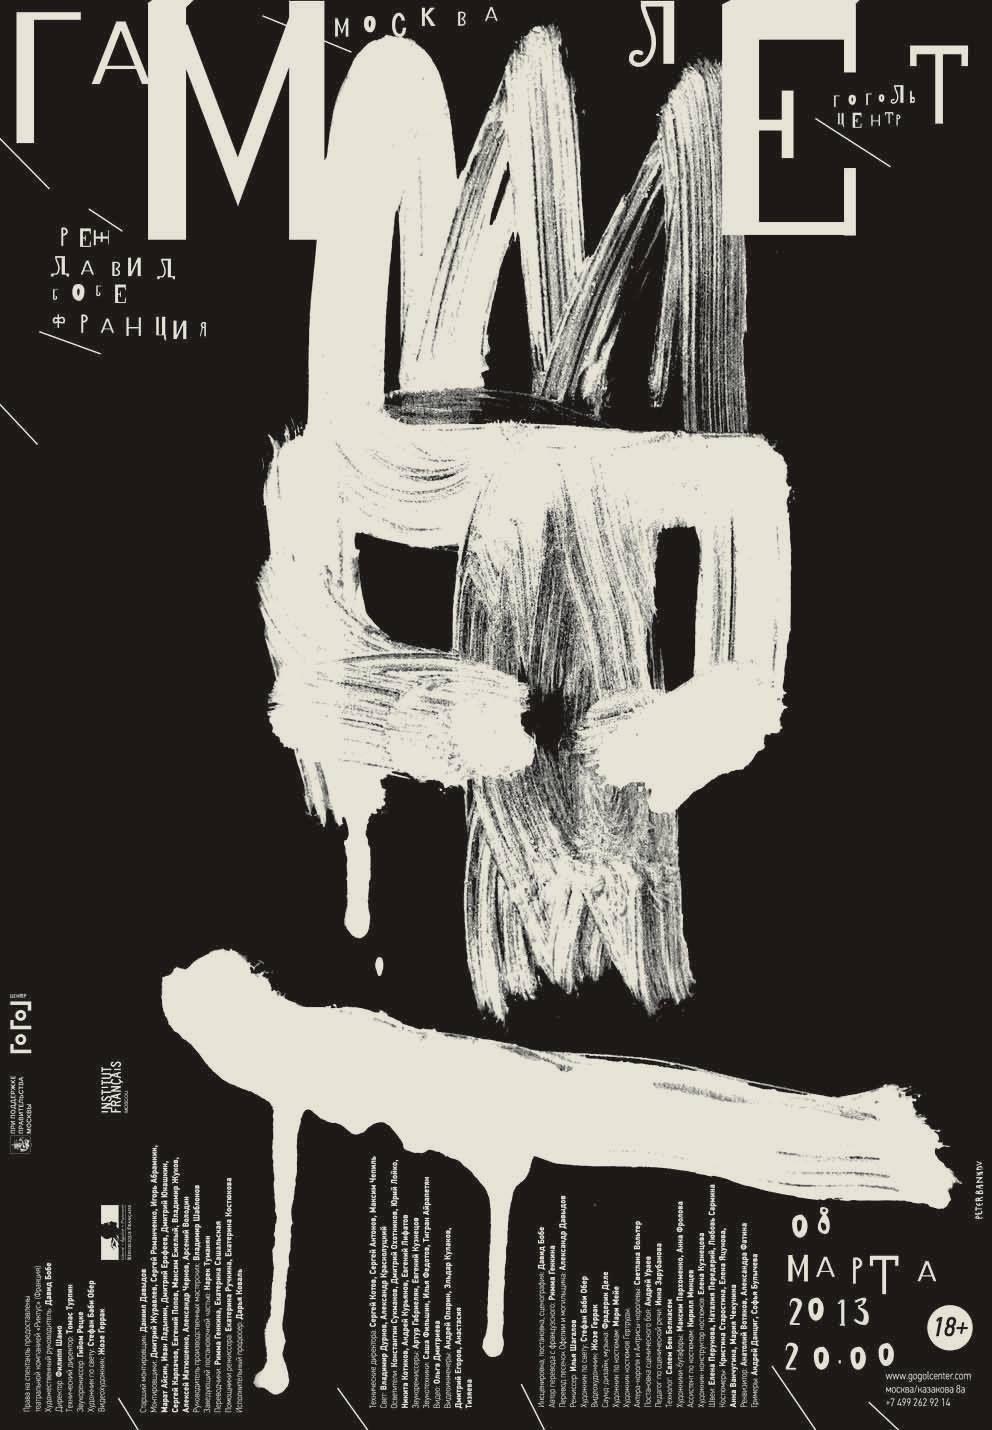 Hamlet. Peter BANKOV | Manifesti grafici, Illustrazioni ...